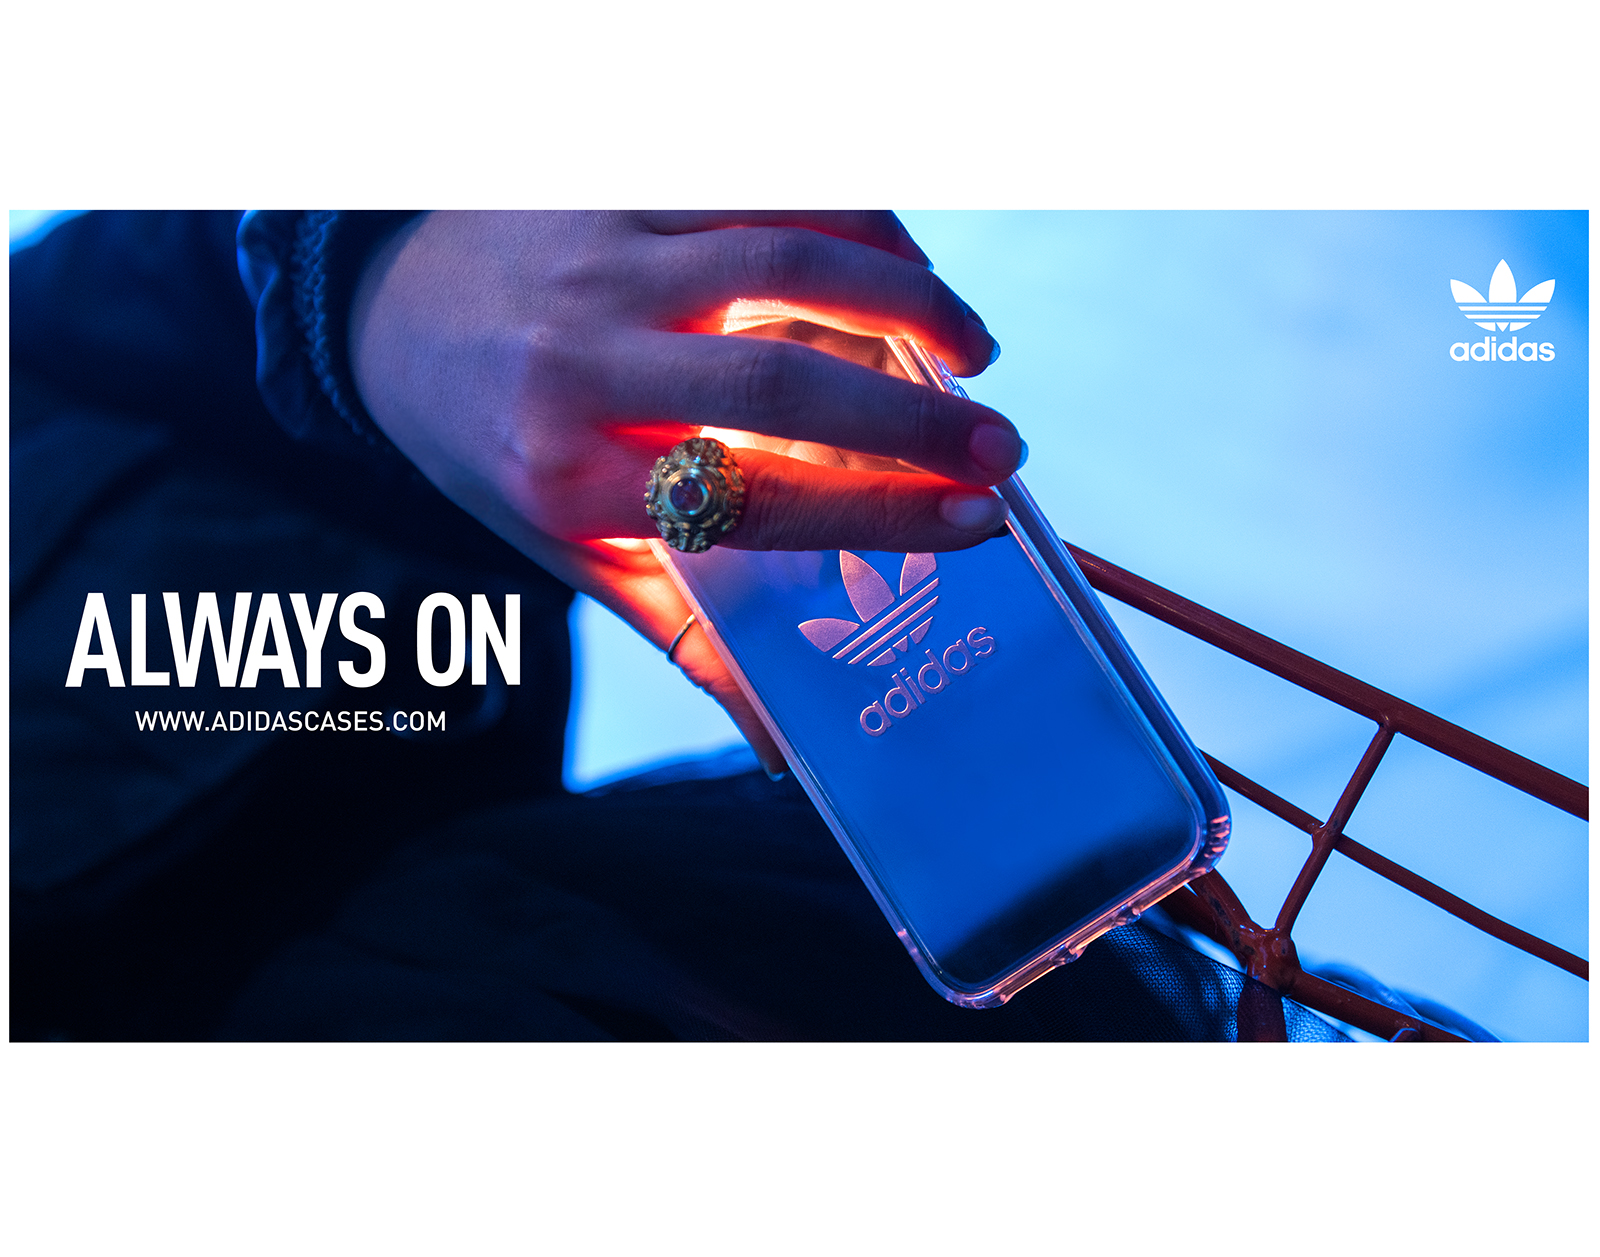 ASS_adidas_Always On 04.jpg